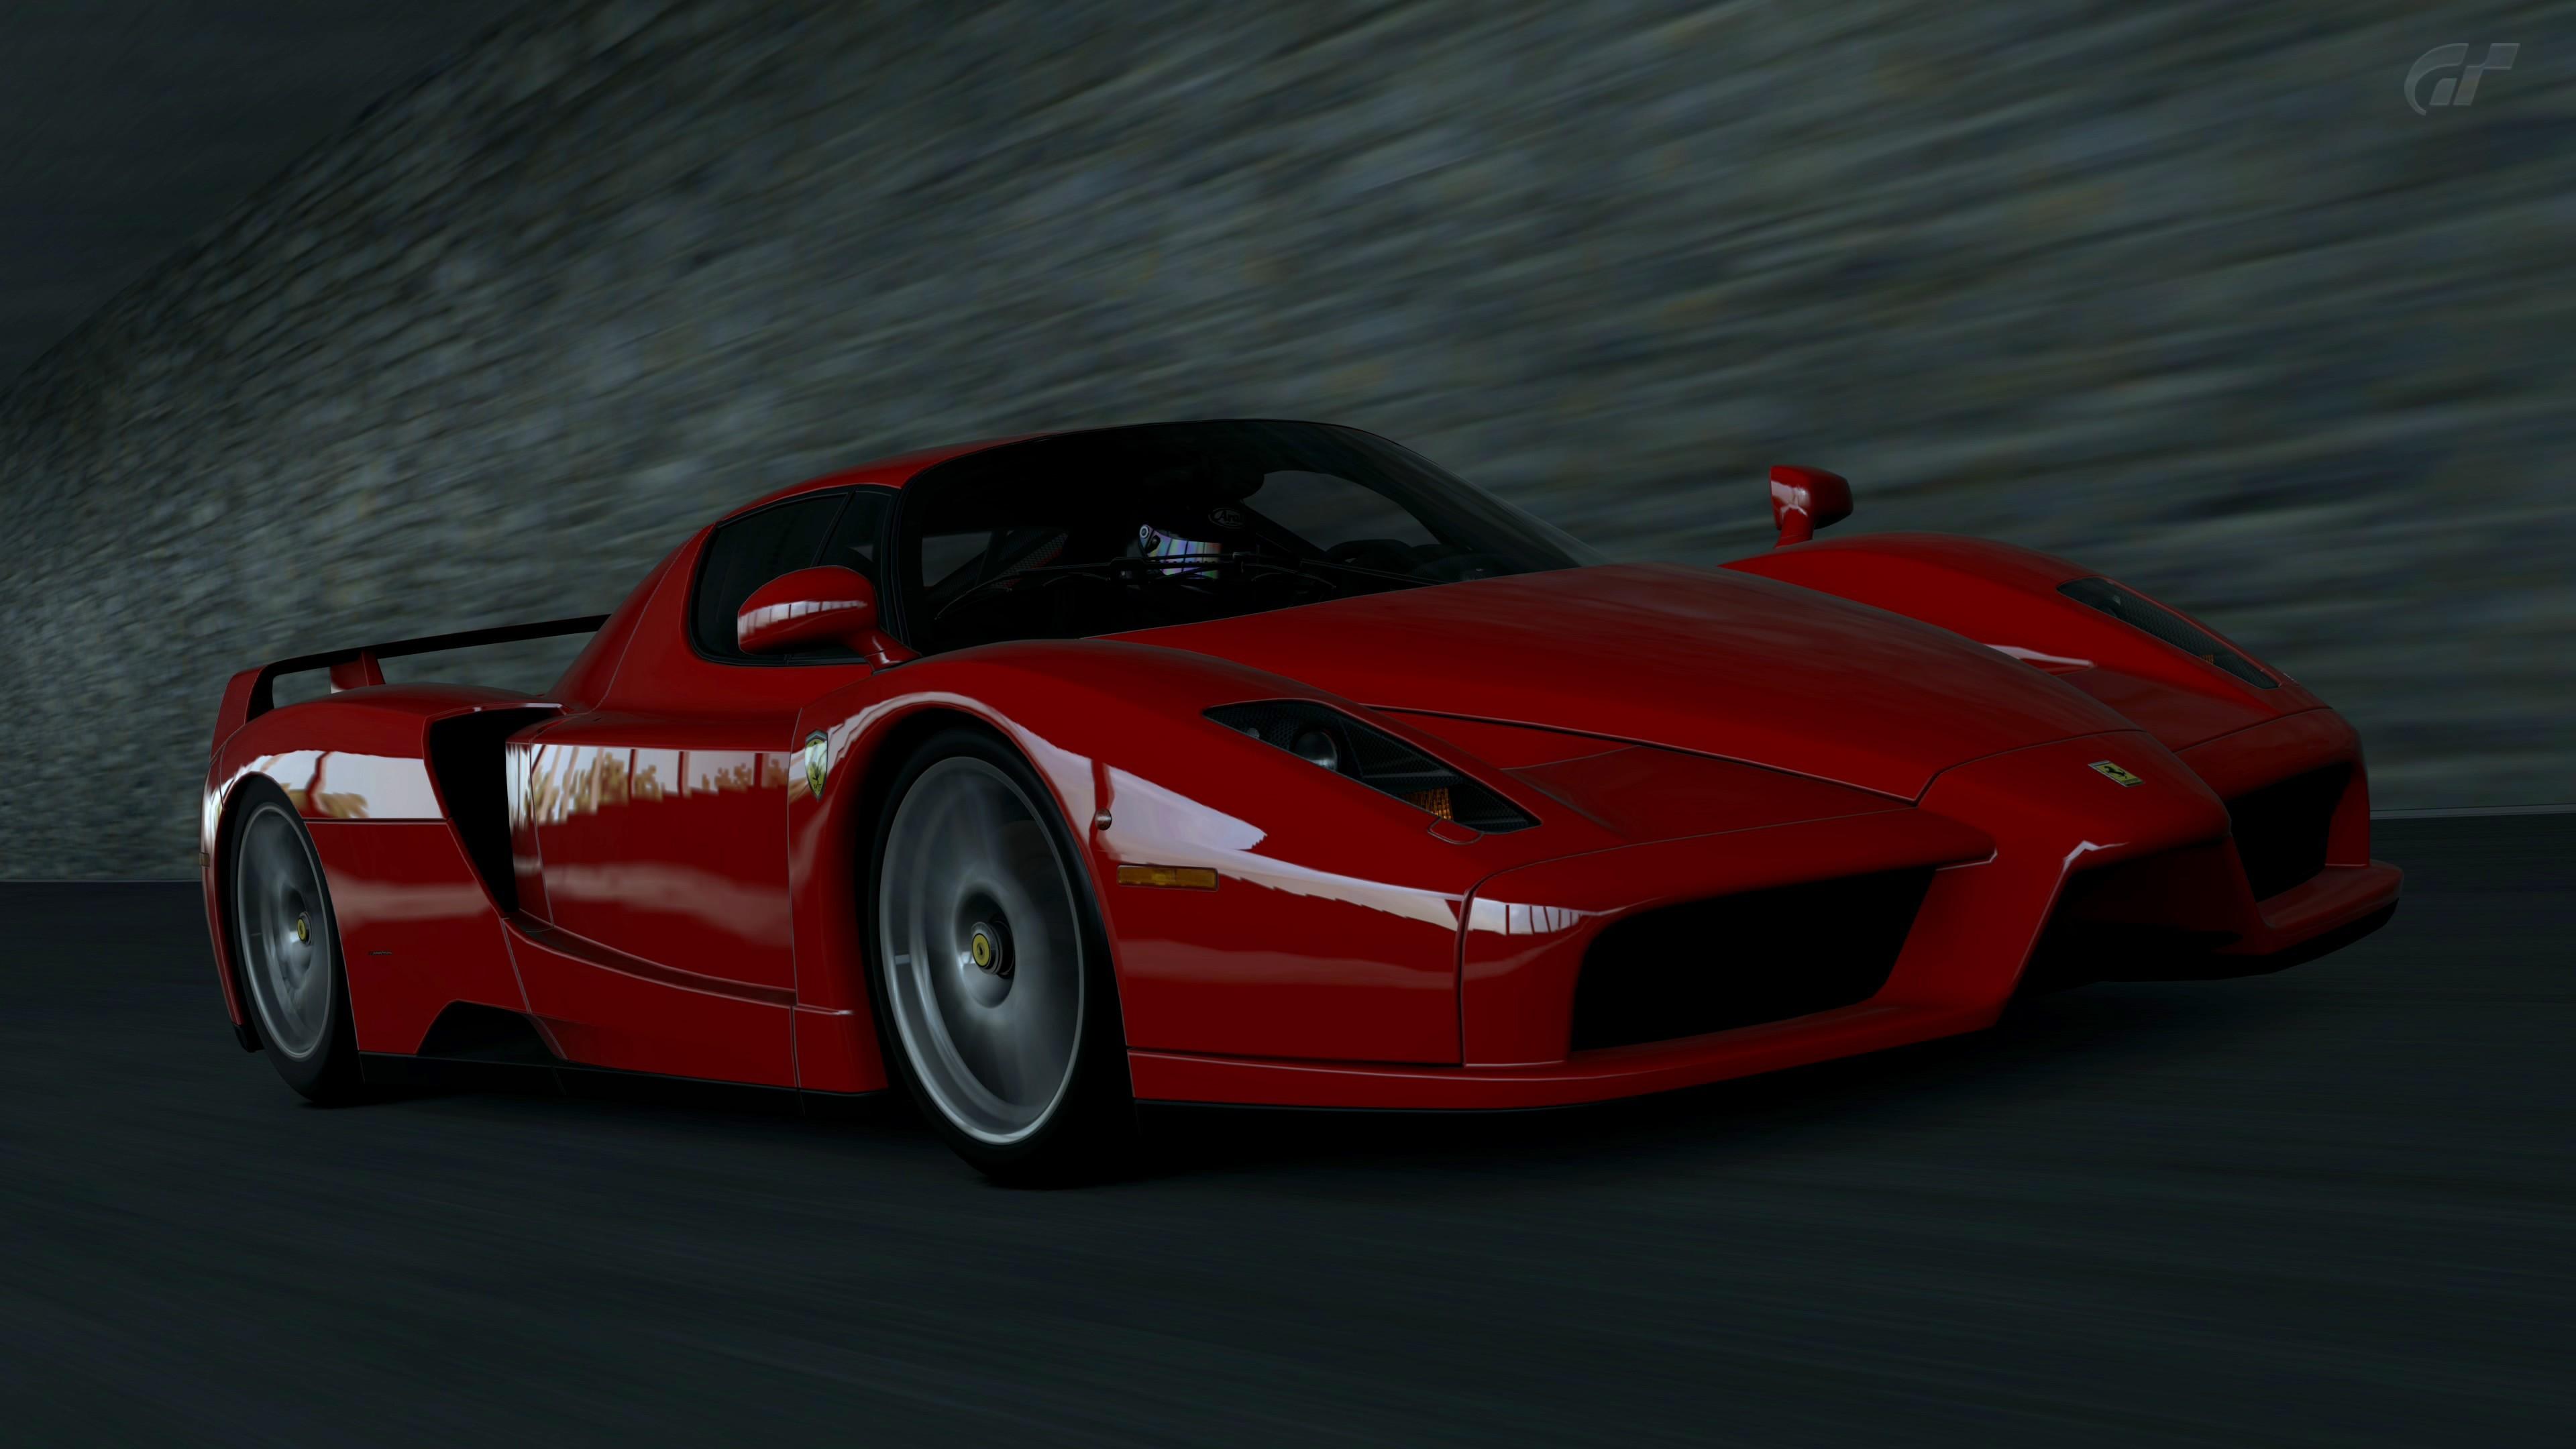 Ferrari Enzo Wallpapers Wallpapertag